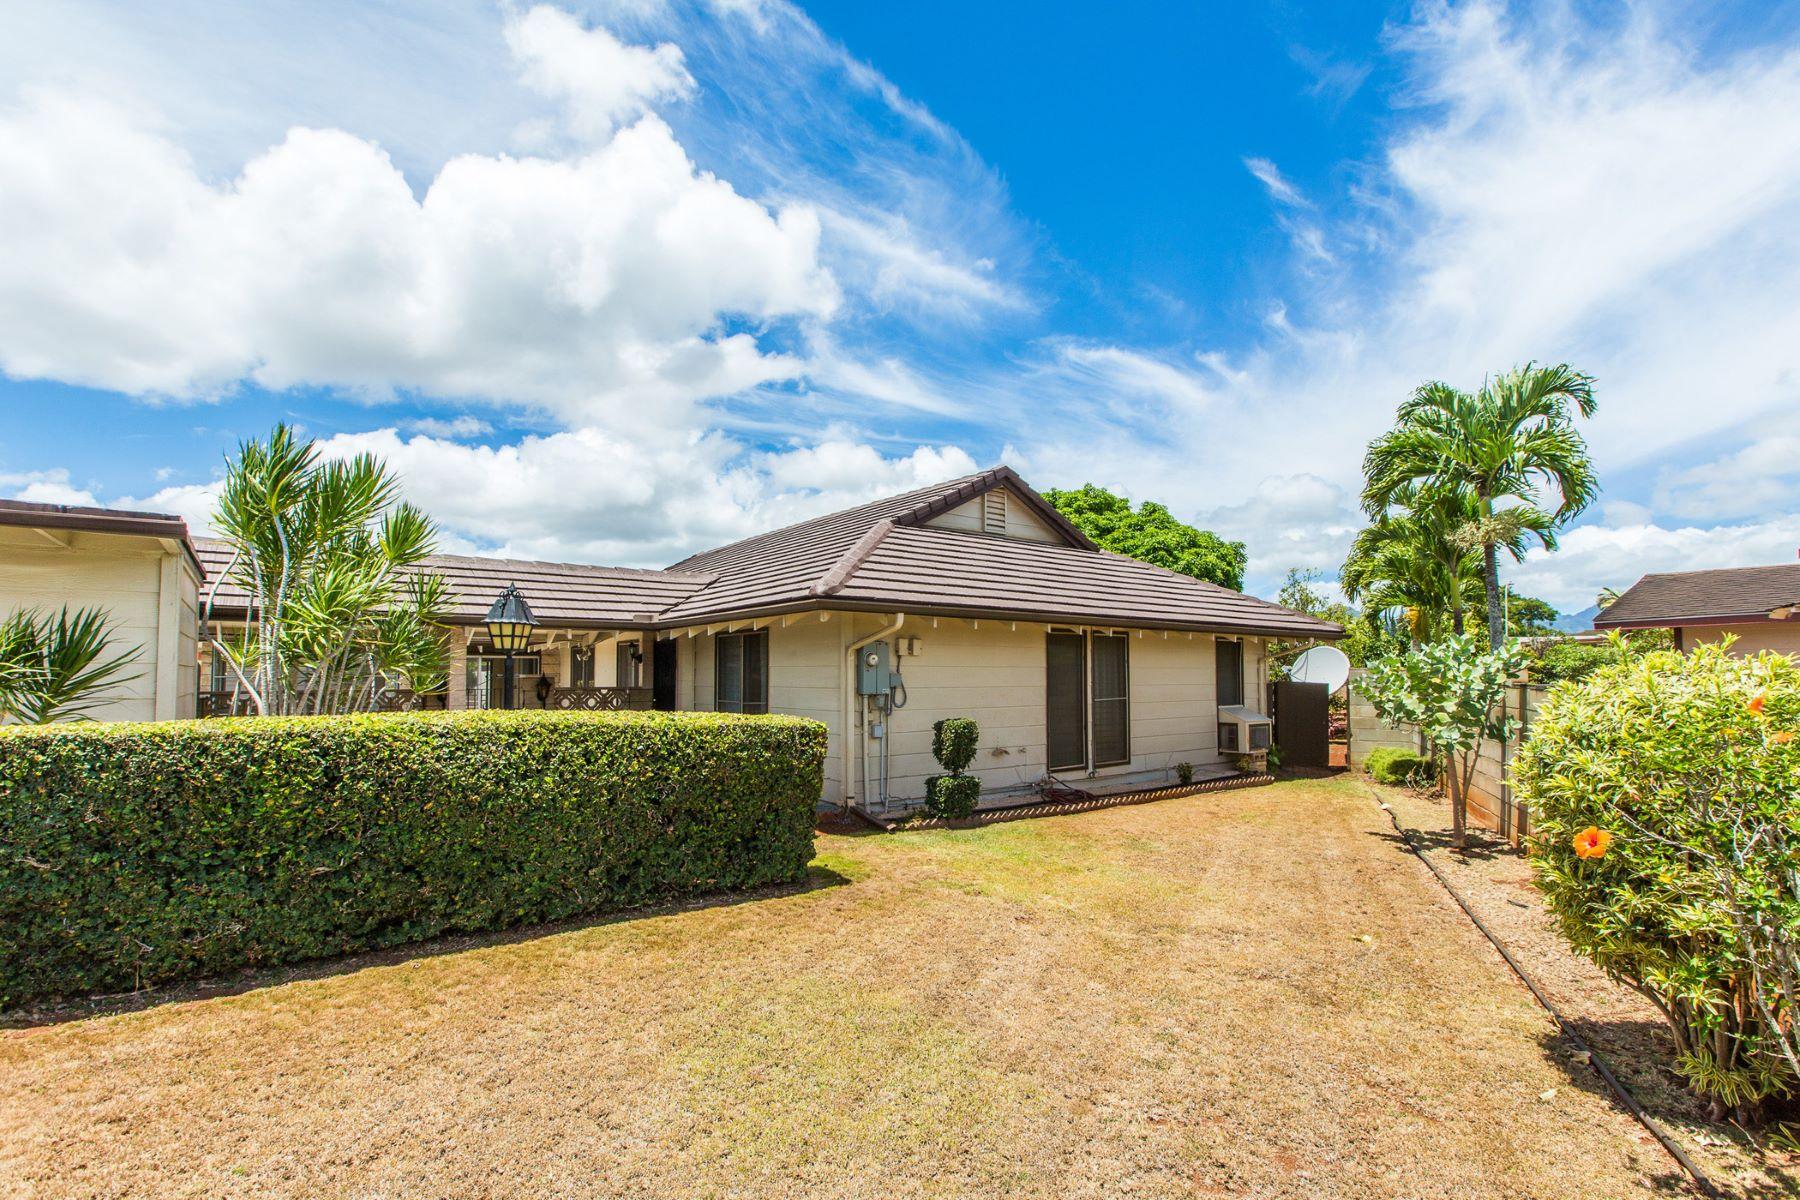 Additional photo for property listing at Remodeled Mililani 95-201 Kahiku Pl Mililani, Hawaii 96789 United States